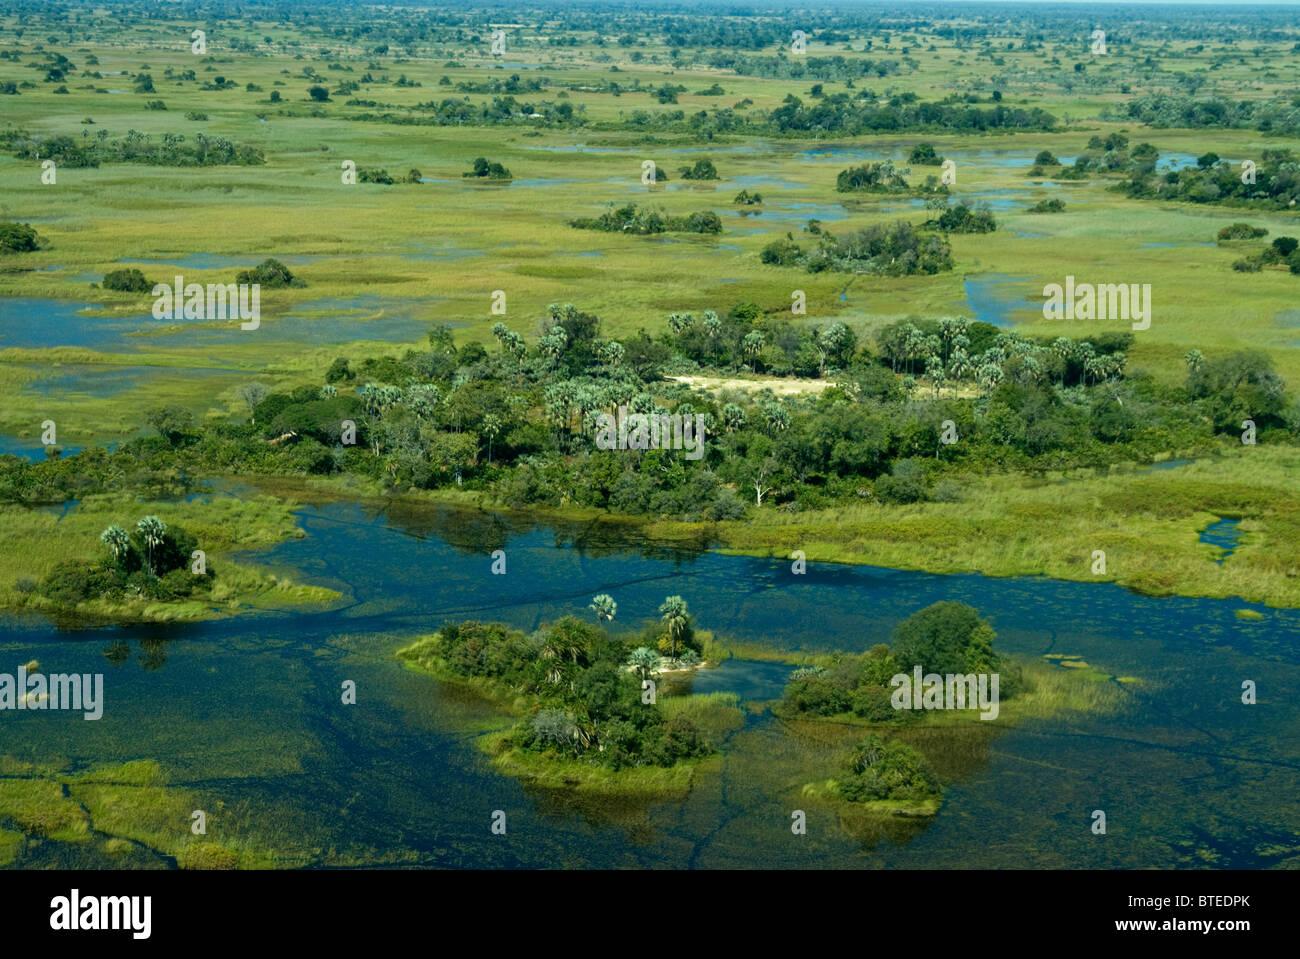 Aerial scenic view of the Okavango delta showing islands and waterways - Stock Image